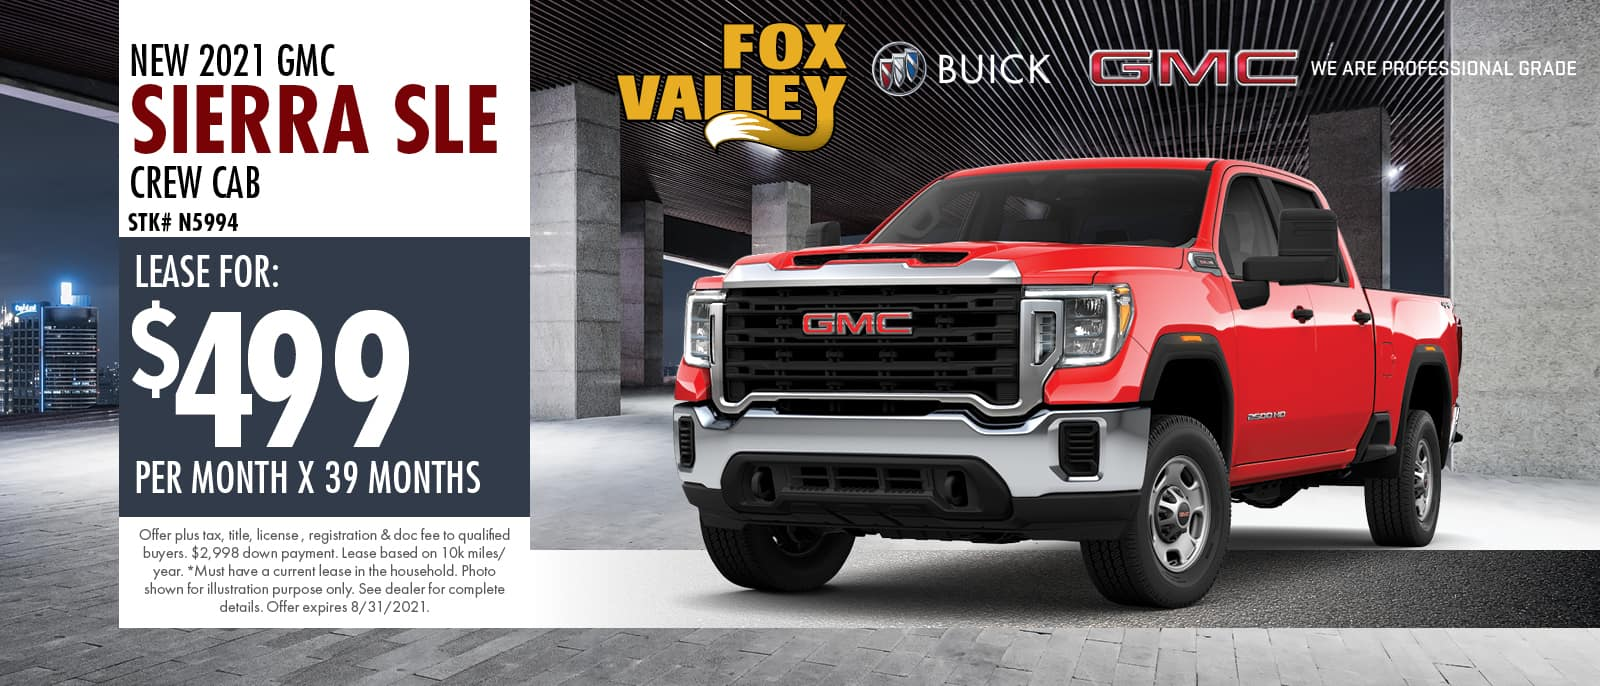 2021 GMC Sierra | Fox Valley Buick GMC